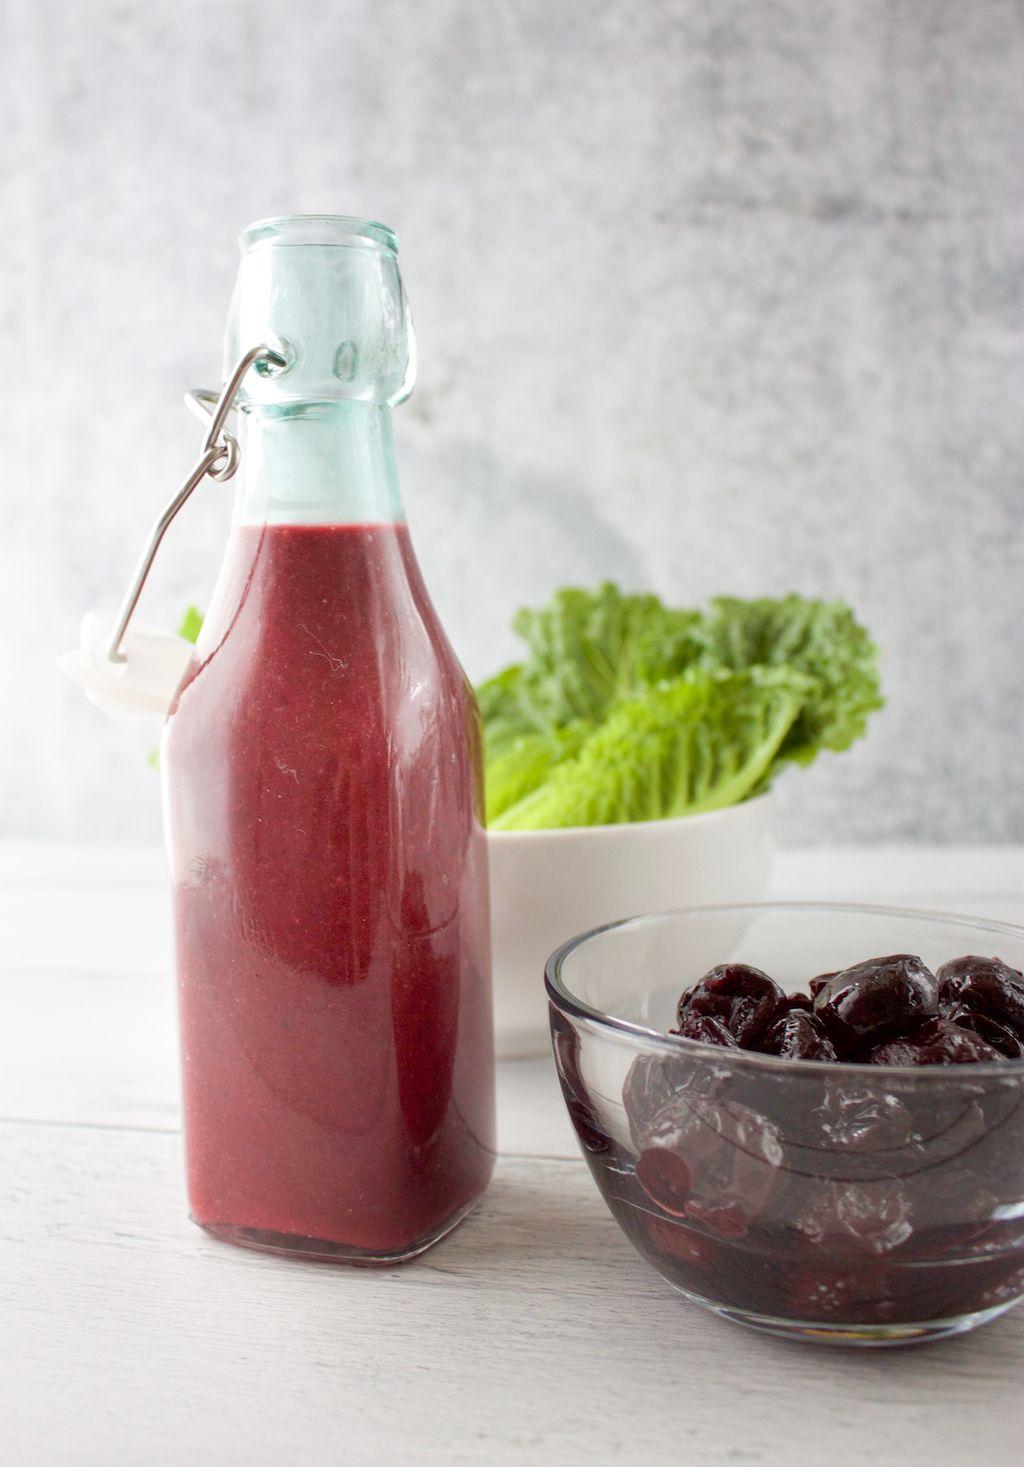 Sweet Cherry Vinaigrette No Sugar Added The Produce Moms Recipe Sweet Cherries Vinaigrette Simple Vinaigrette